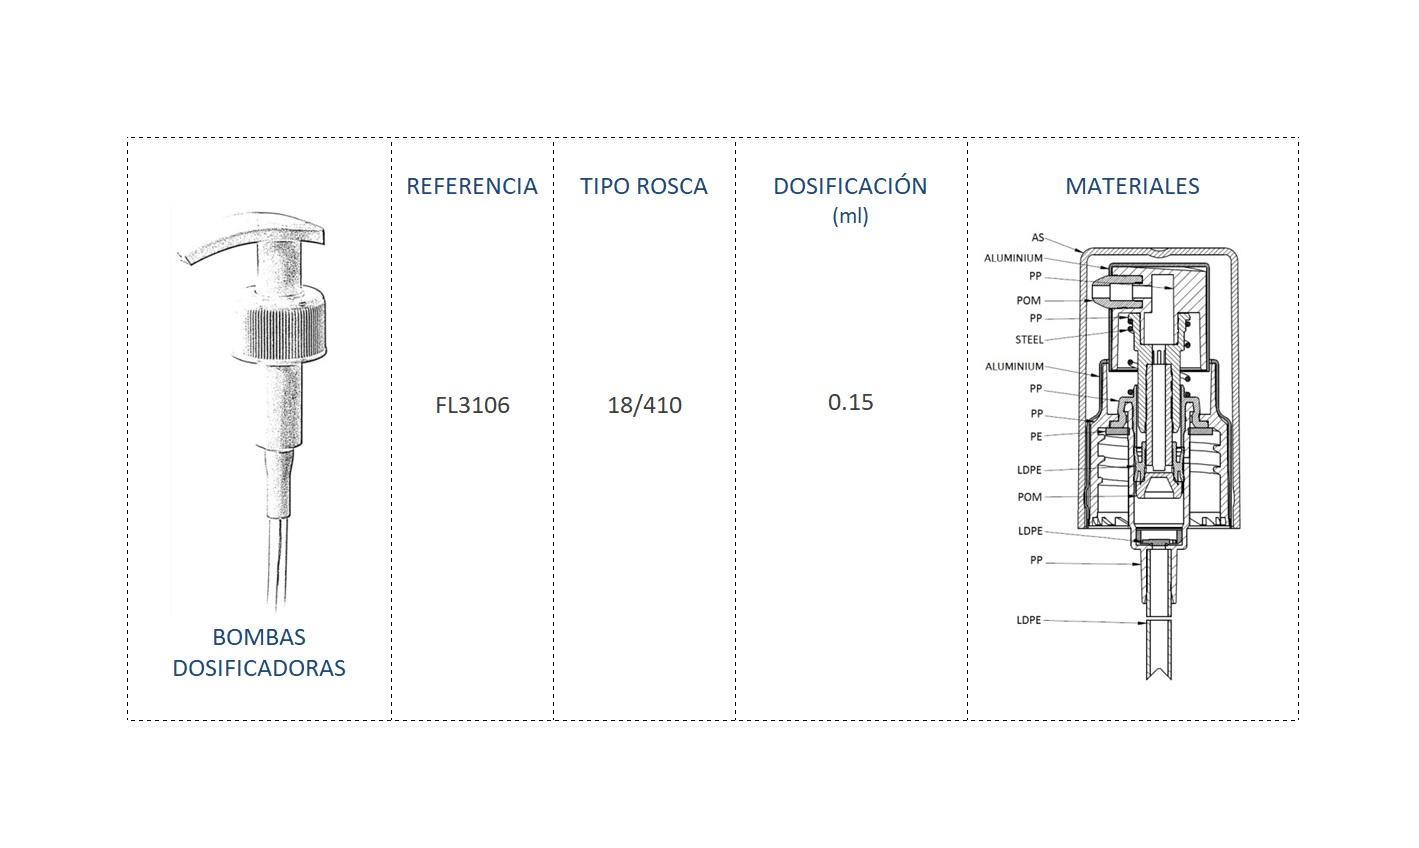 Cuadro de materiales bomba dosificadora FL3106 18/410